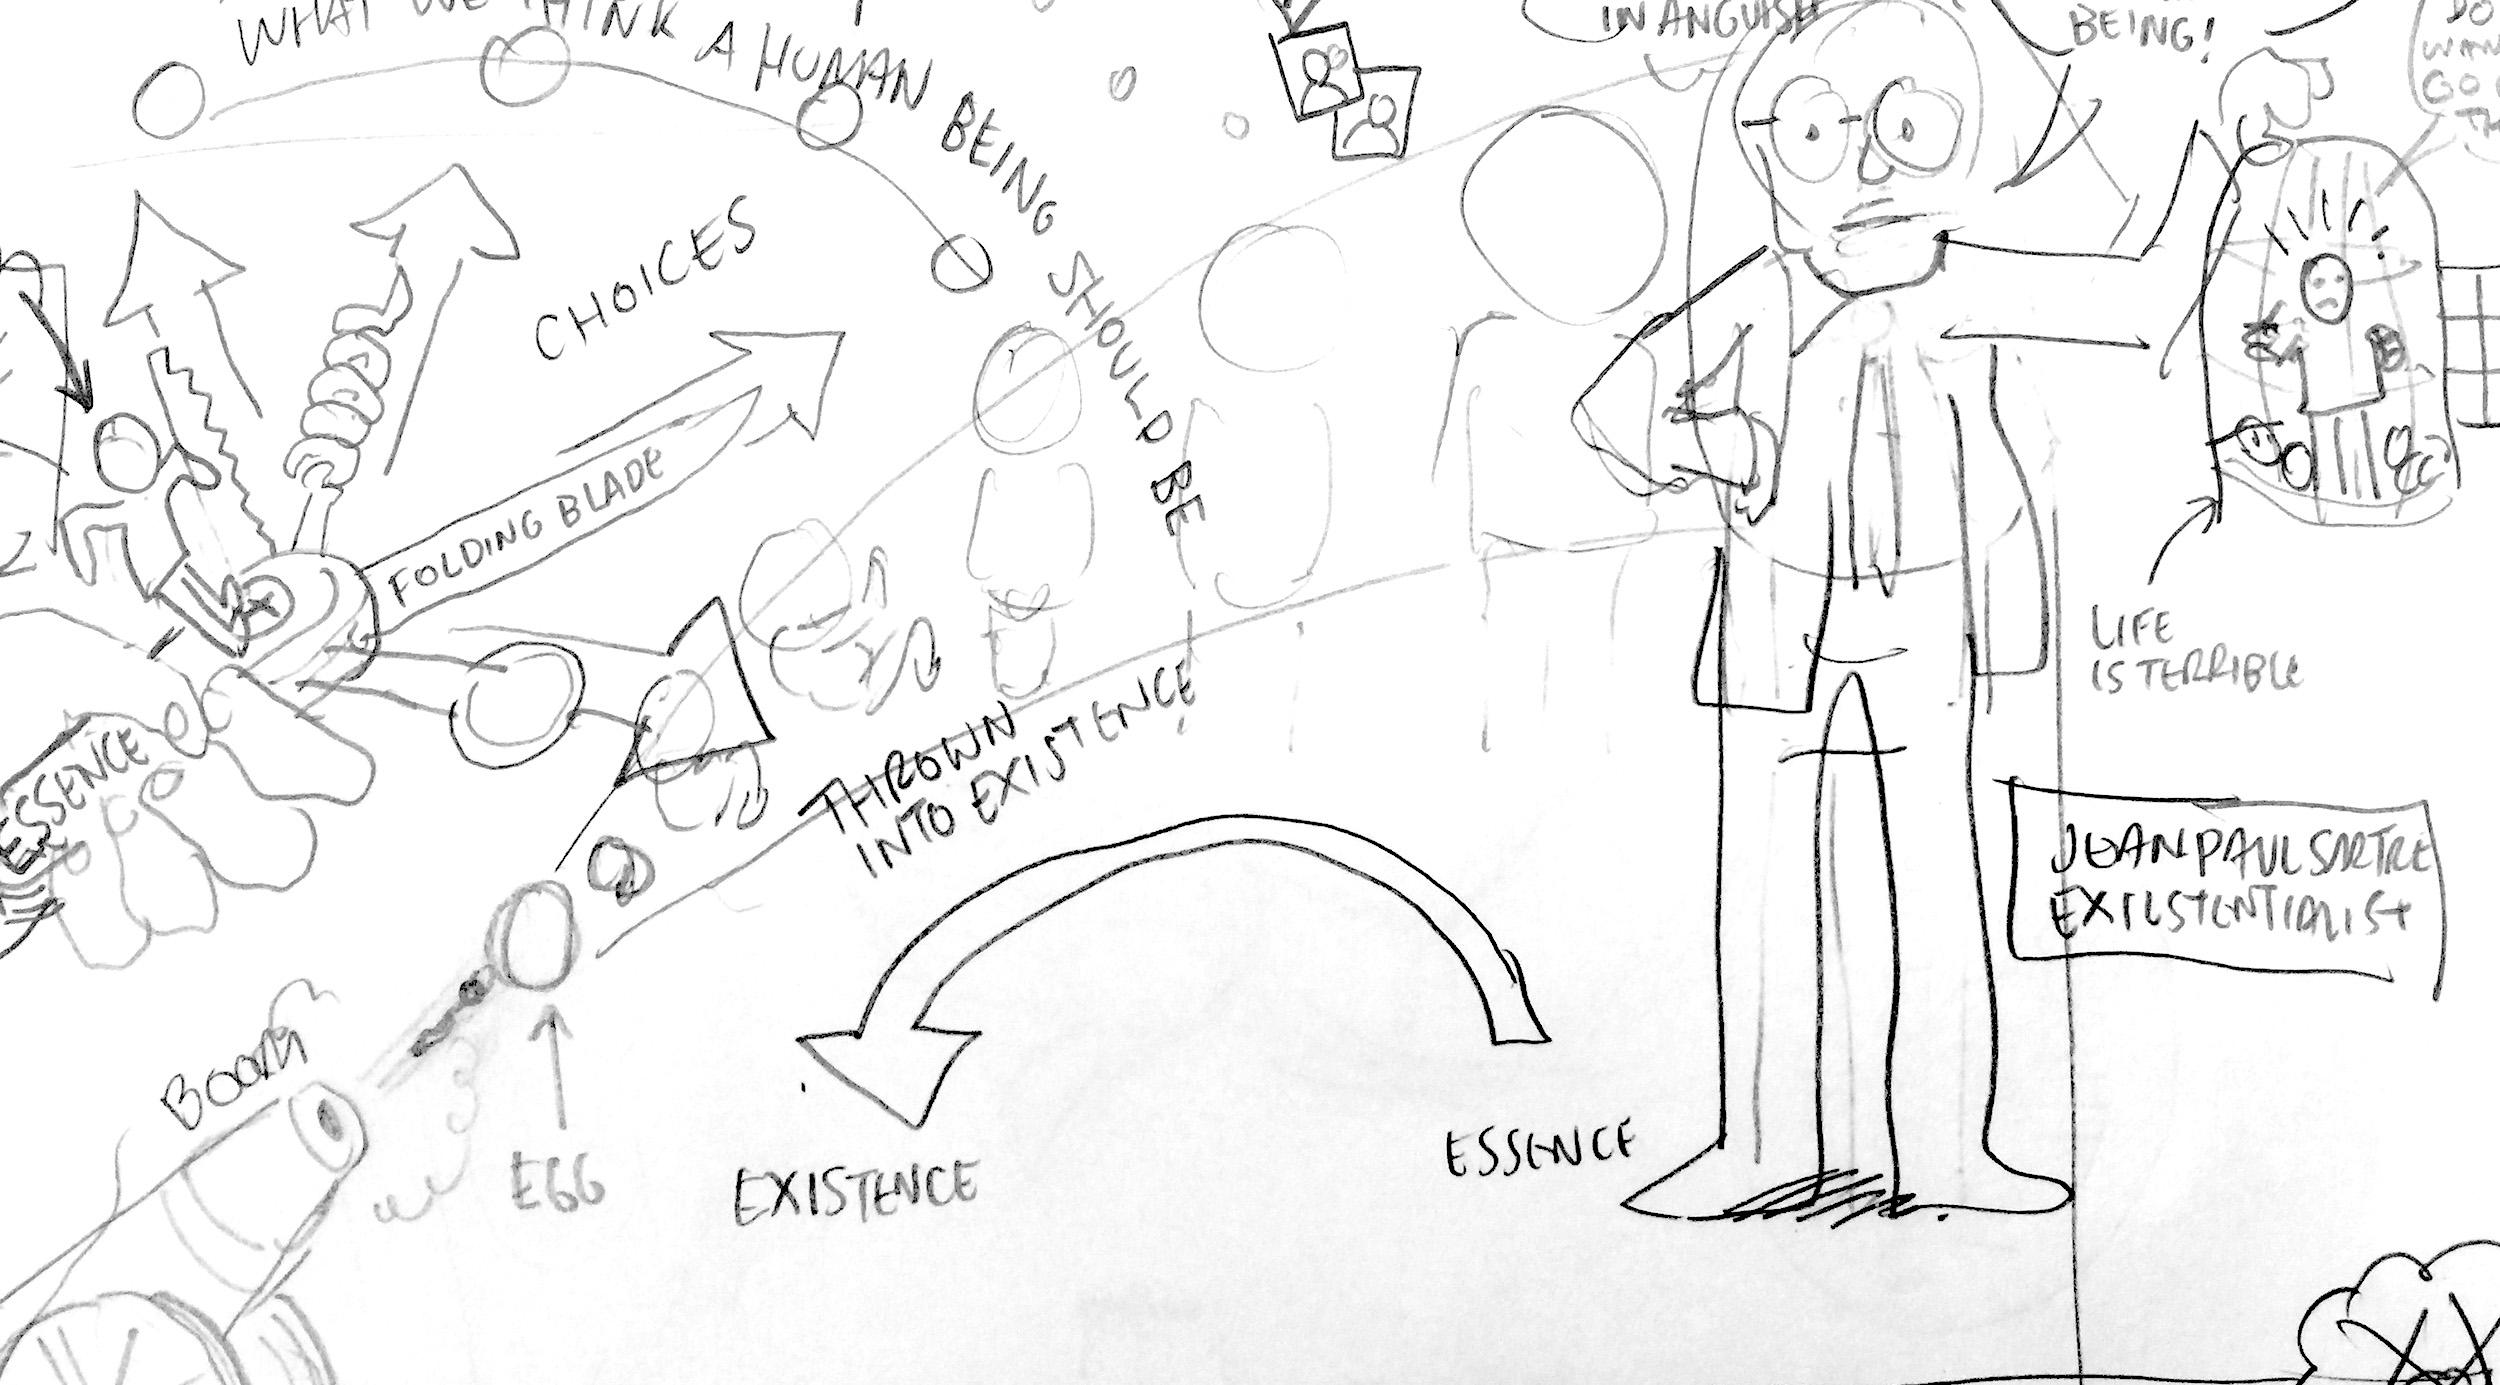 bbc-history-of-ideas-Q9-D-cognitive-01.jpg